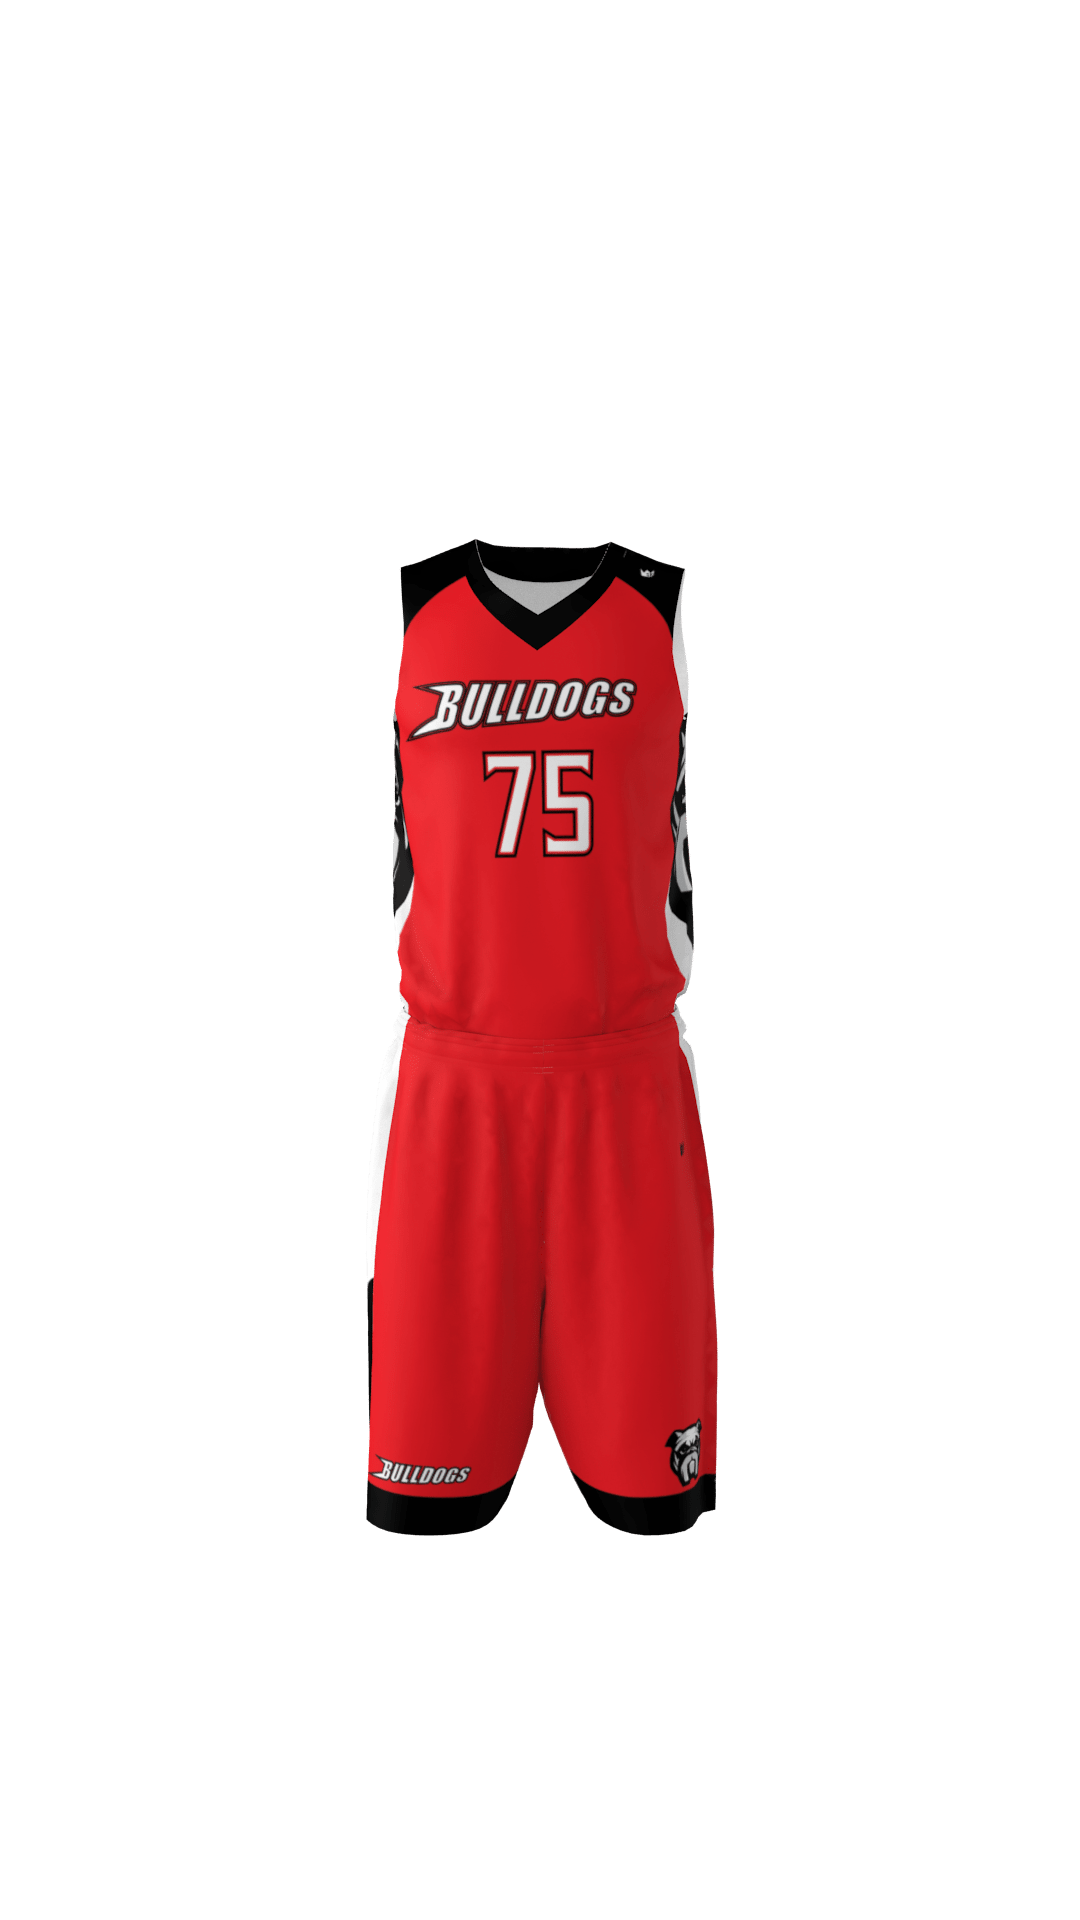 4d1a78d5e853 Bulldogs Reversible Basketball Uniform – Sublimation Kings